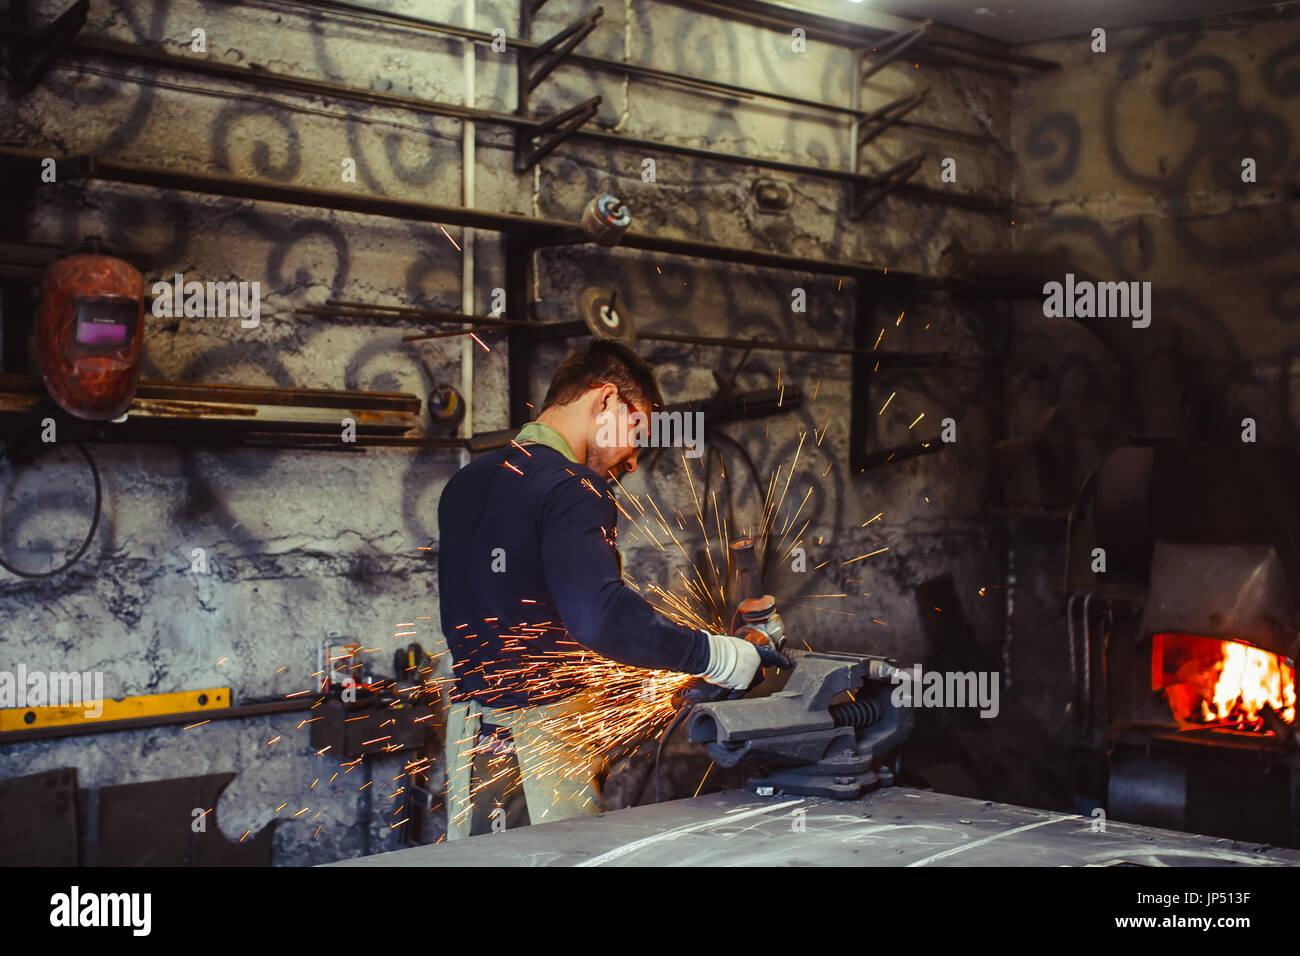 Craftsman sawing metal sparkles all around workshop. Working at noon. Stock Photo